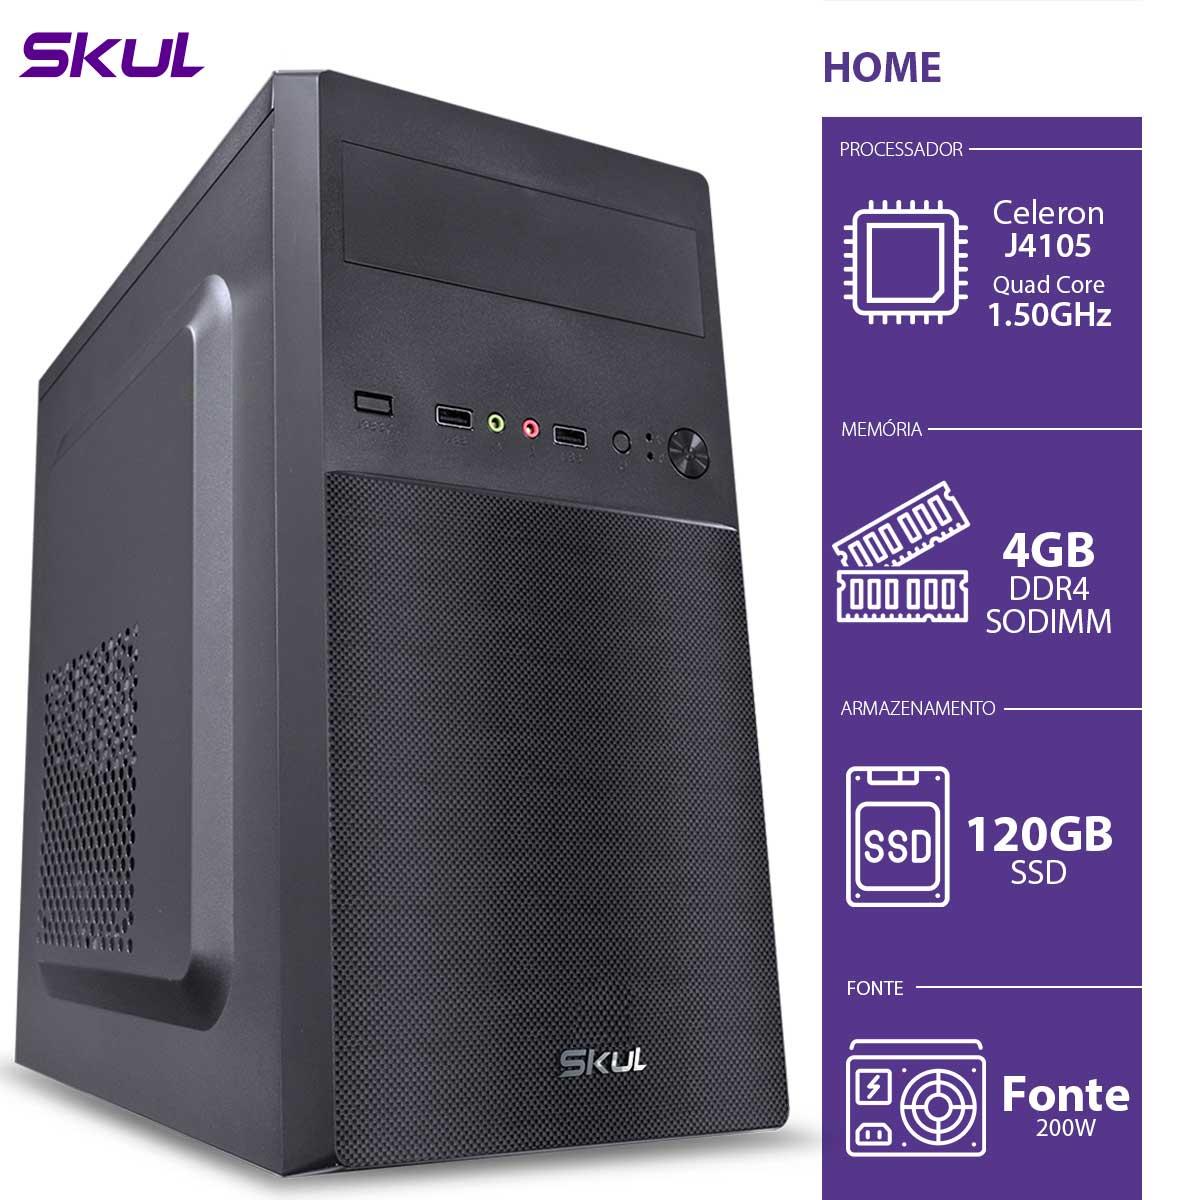 COMPUTADOR HOME H100 - CELERON QUAD CORE J4105 1.50GHZ MEM 4GB DDR4 SODIMM SSD 120GB HDMI/VGA FONTE 200W